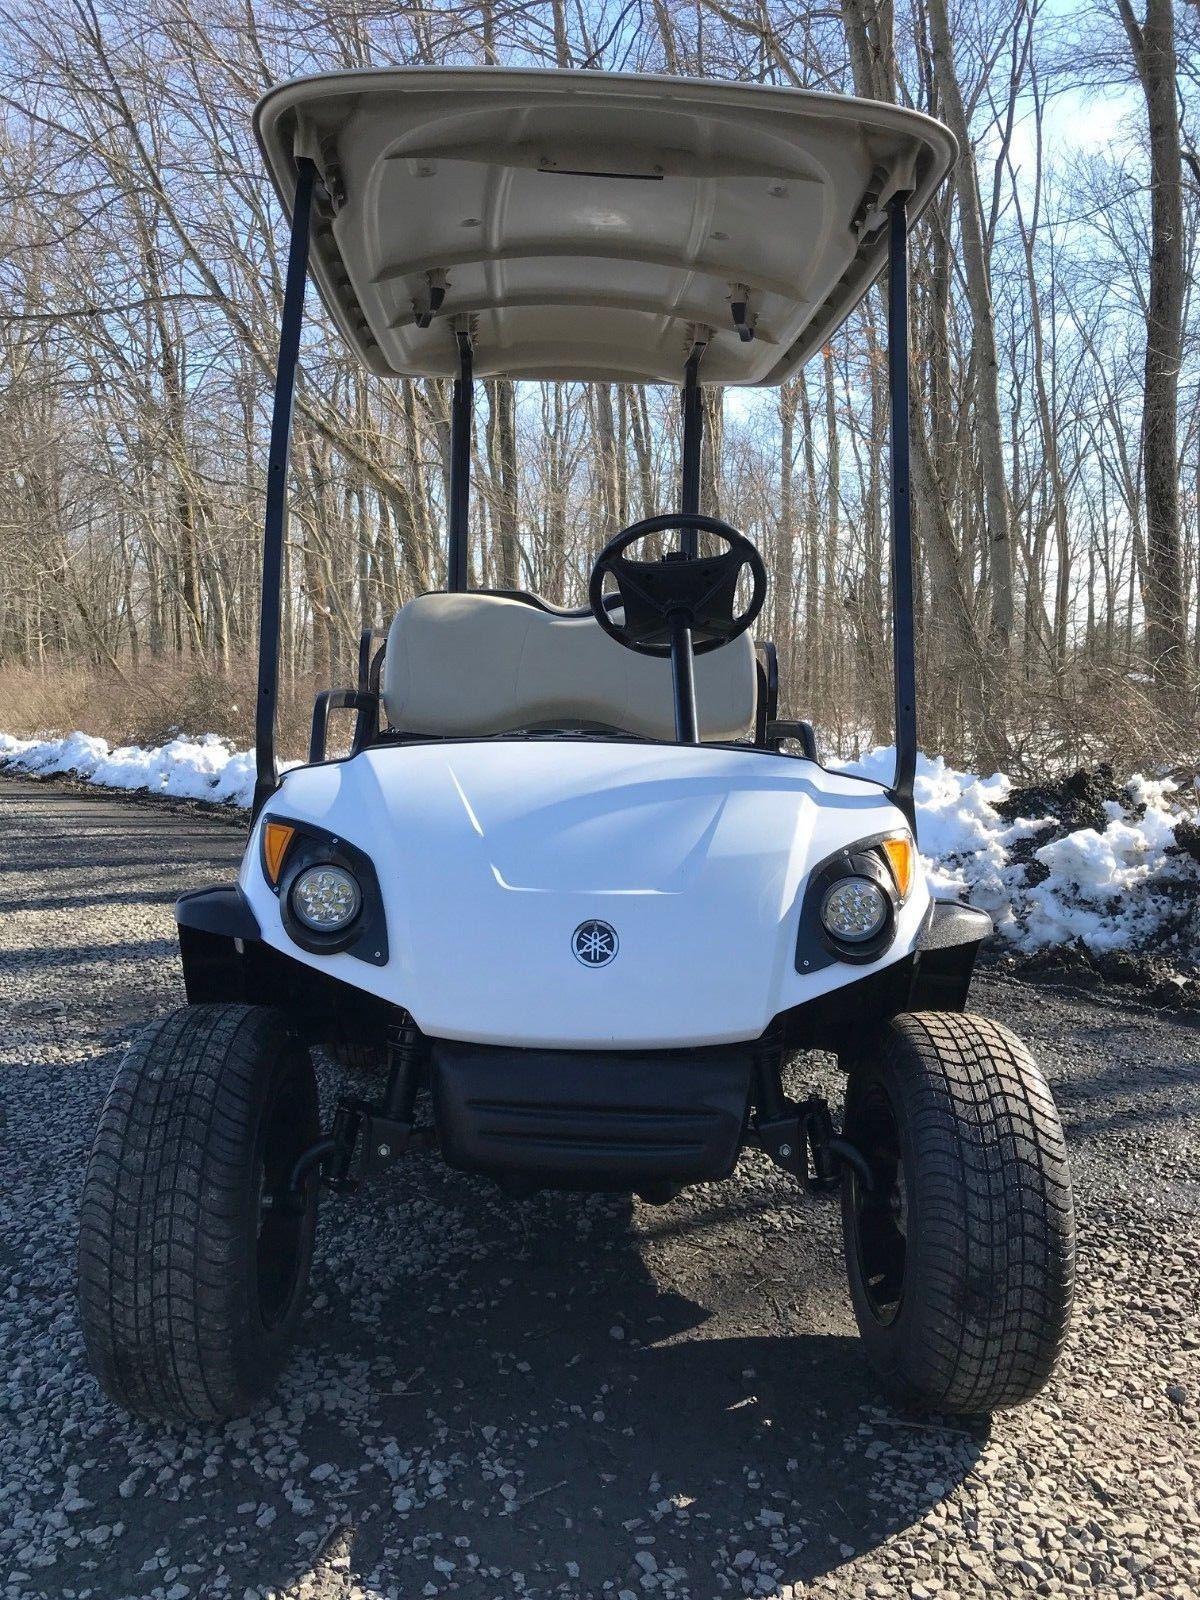 Lifted Yamaha G29 Drive Gas Golf Cart For Sale